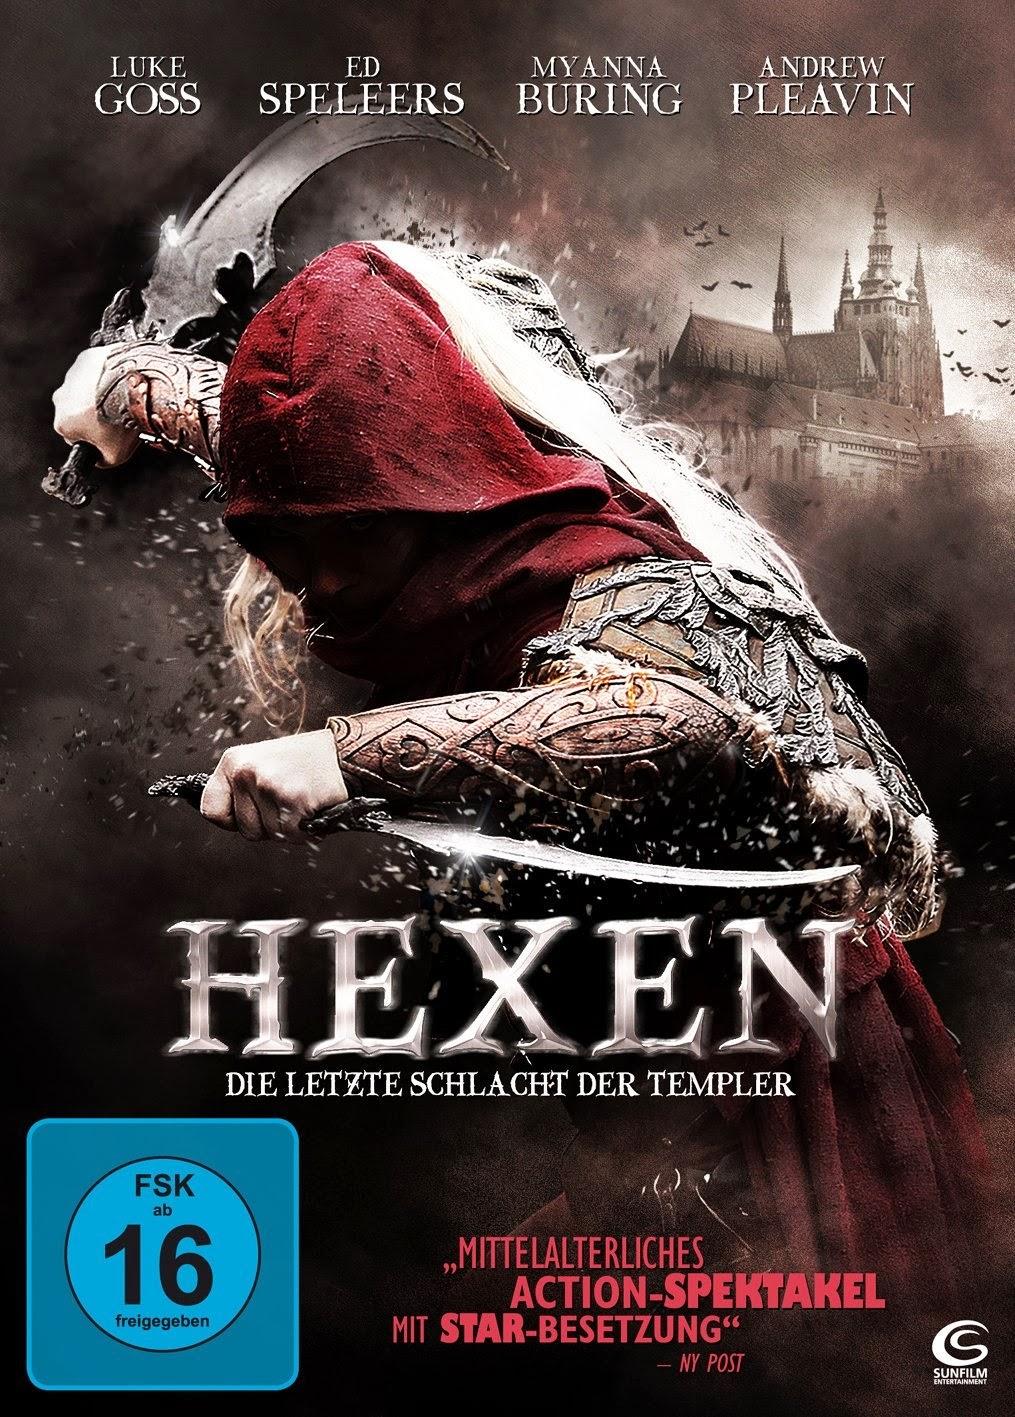 http://www.amazon.de/Hexen-Die-letzte-Schlacht-Templer/dp/B0052SRKHG/ref=sr_1_4?ie=UTF8&qid=1392446303&sr=8-4&keywords=hexen